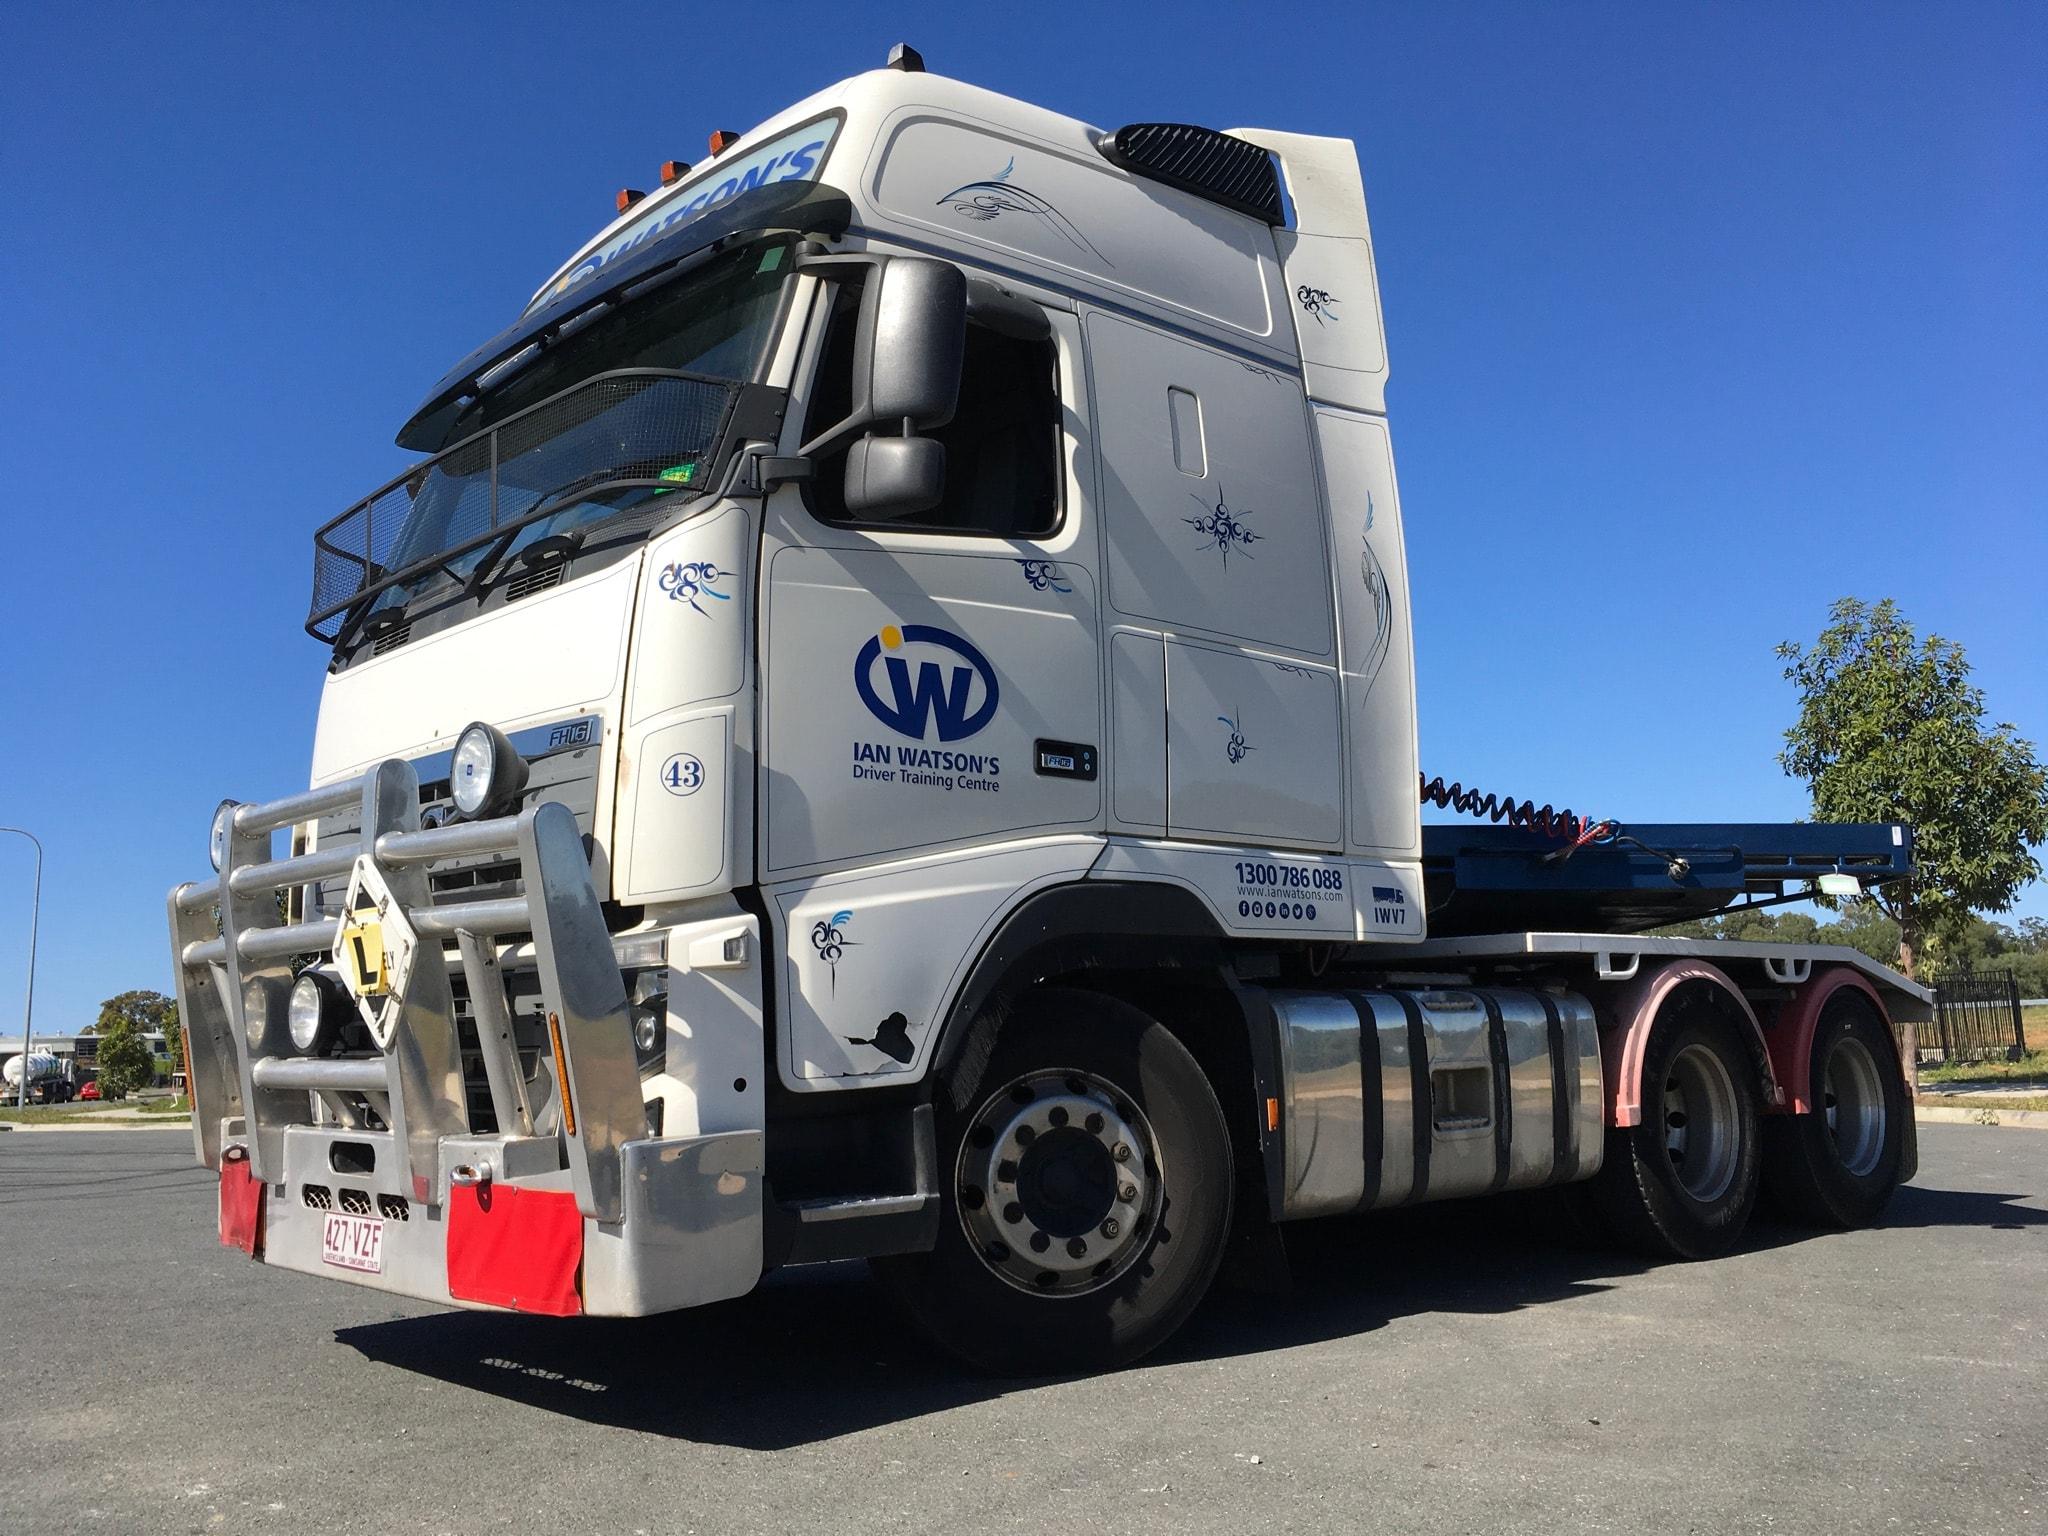 Ian Watson's - An Affordable Truck Driving School